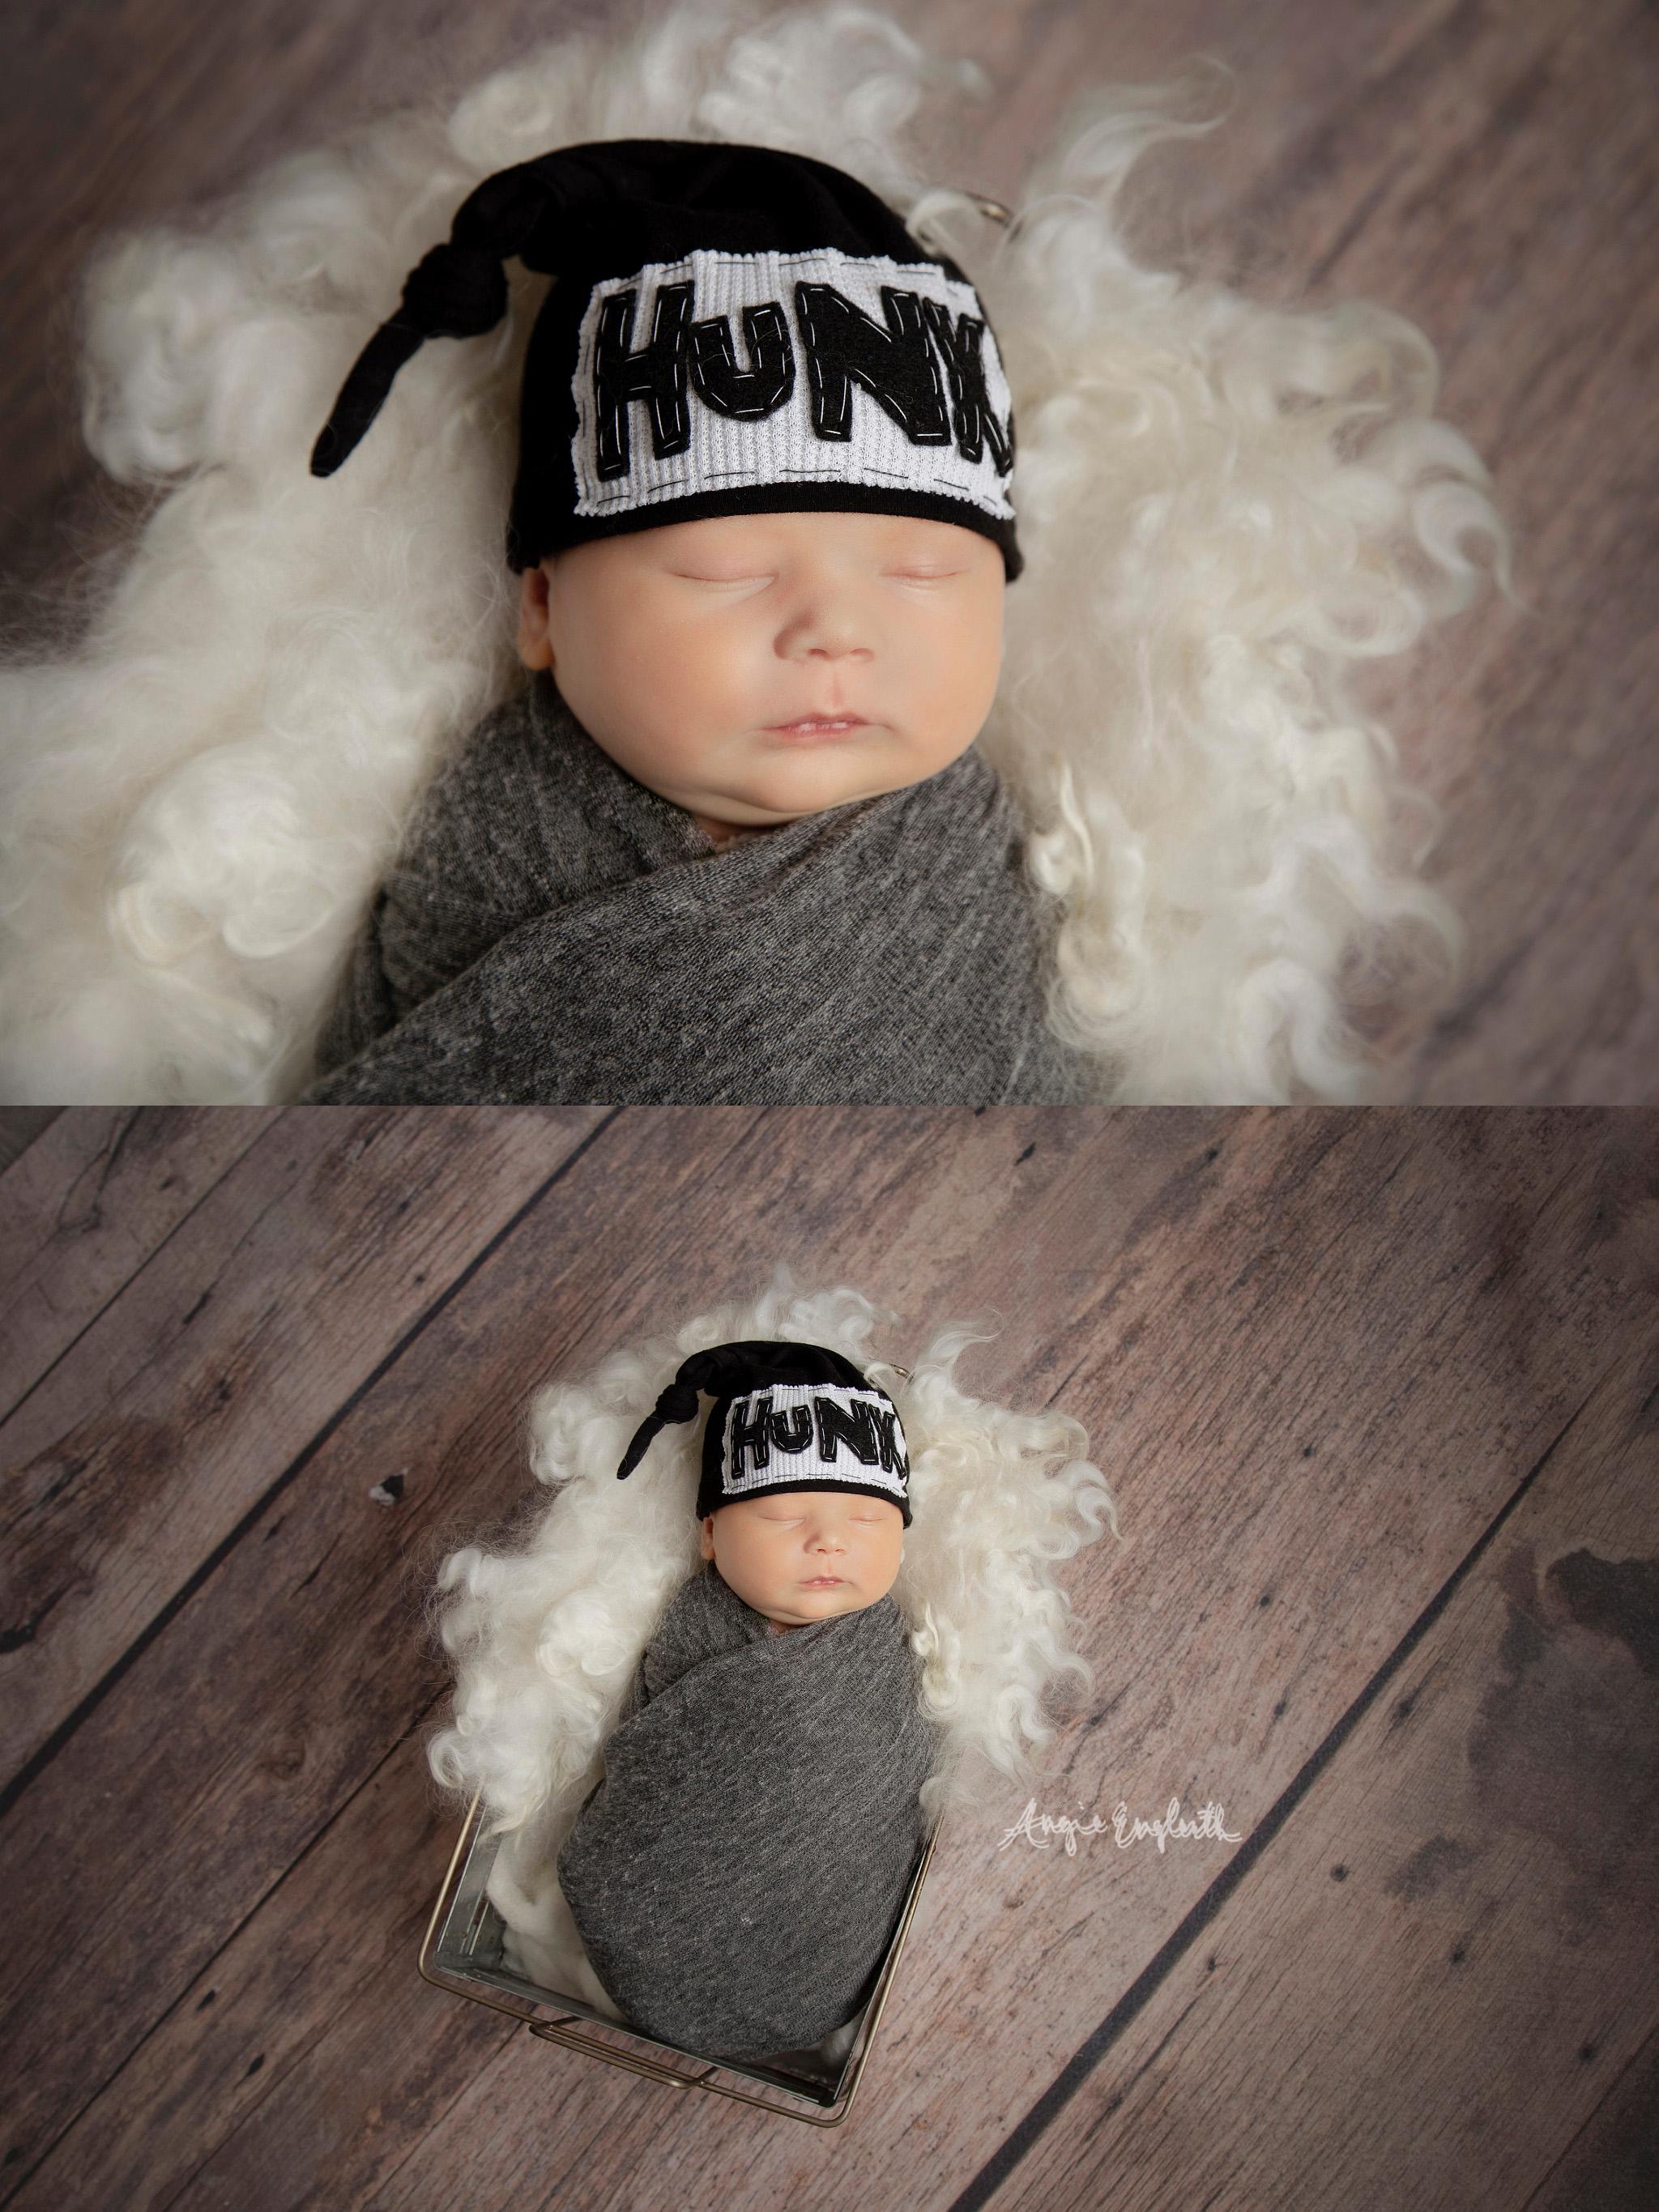 lancaster_newborn_photographer_angie_englerth_central_pa_018.jpg